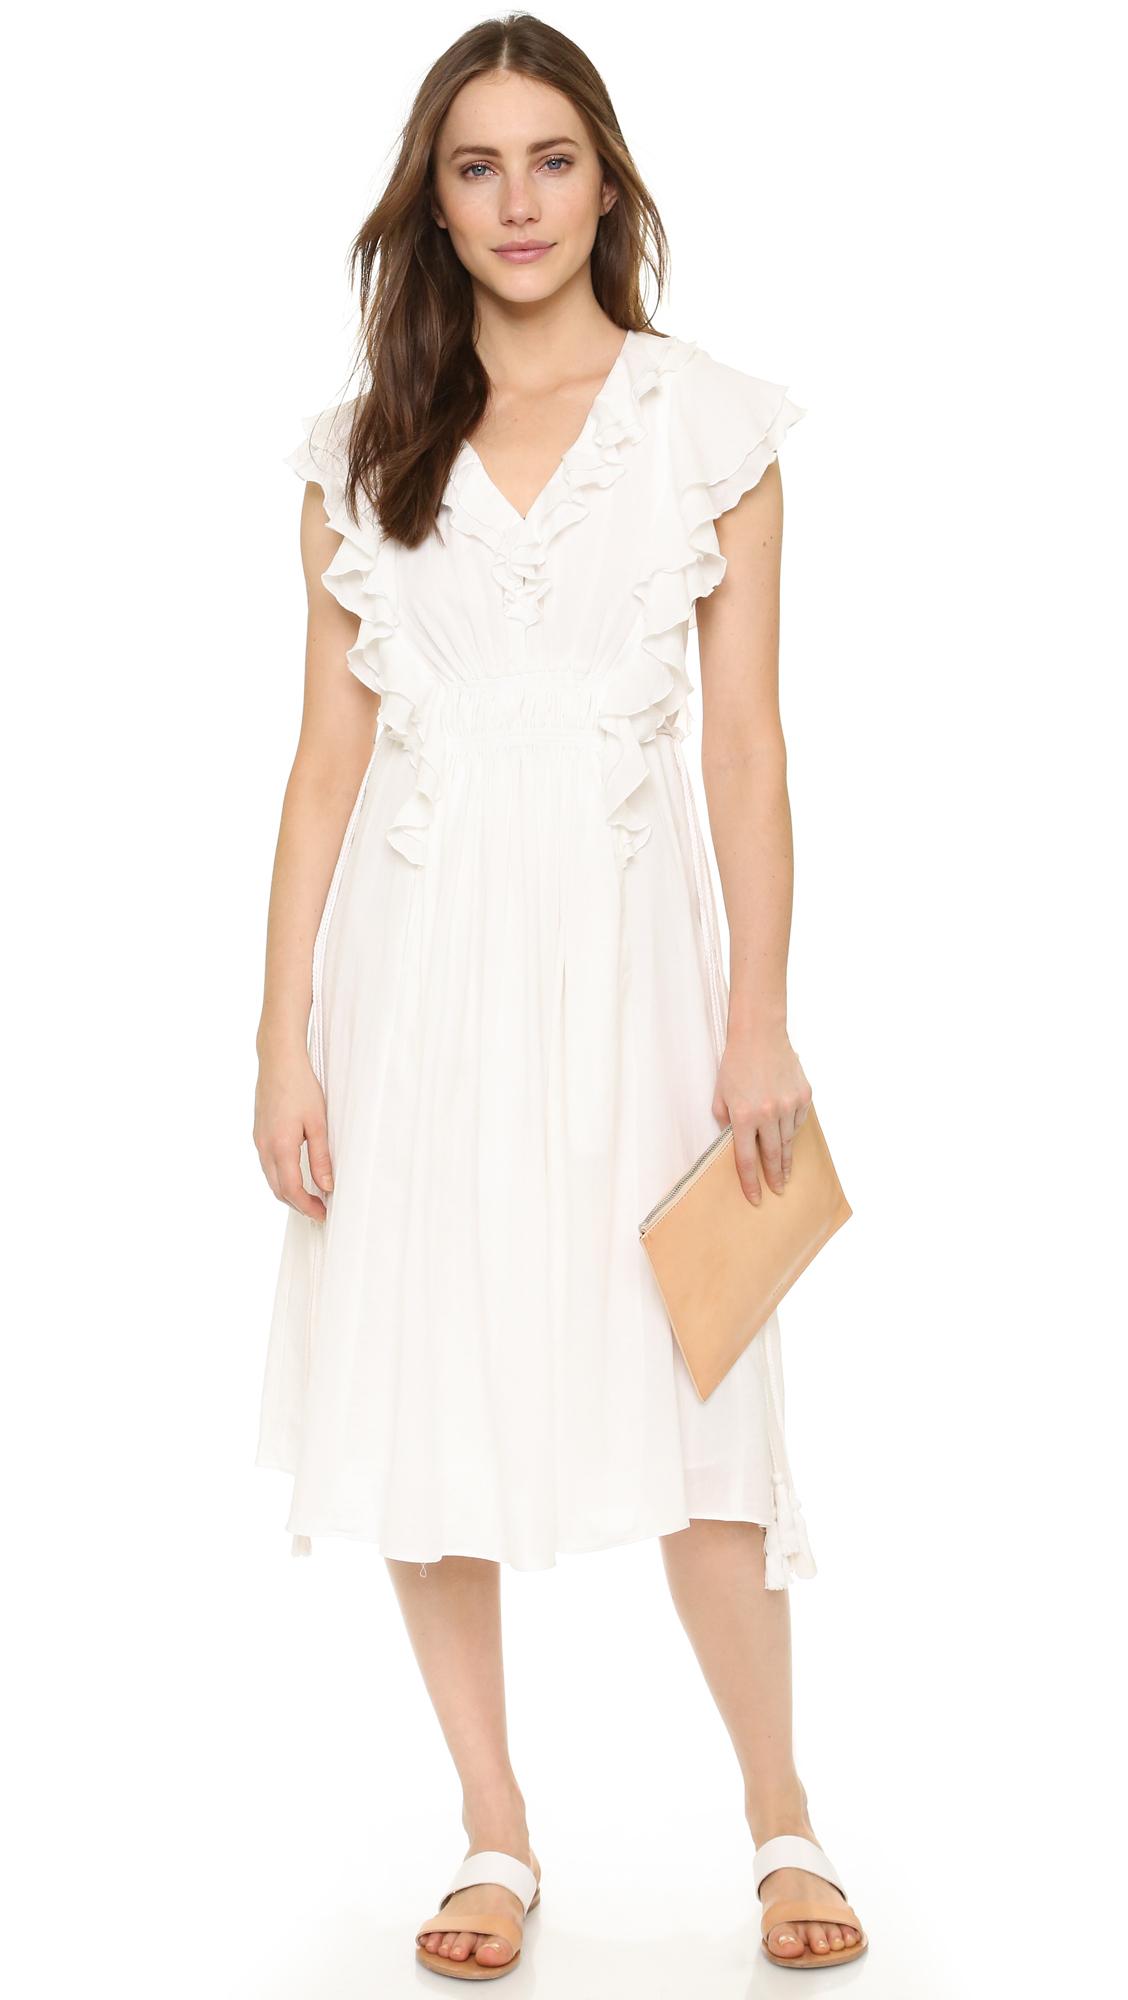 66cd4db948b Lyst - Apiece Apart San Rafael Midi Ruffle Dress in White